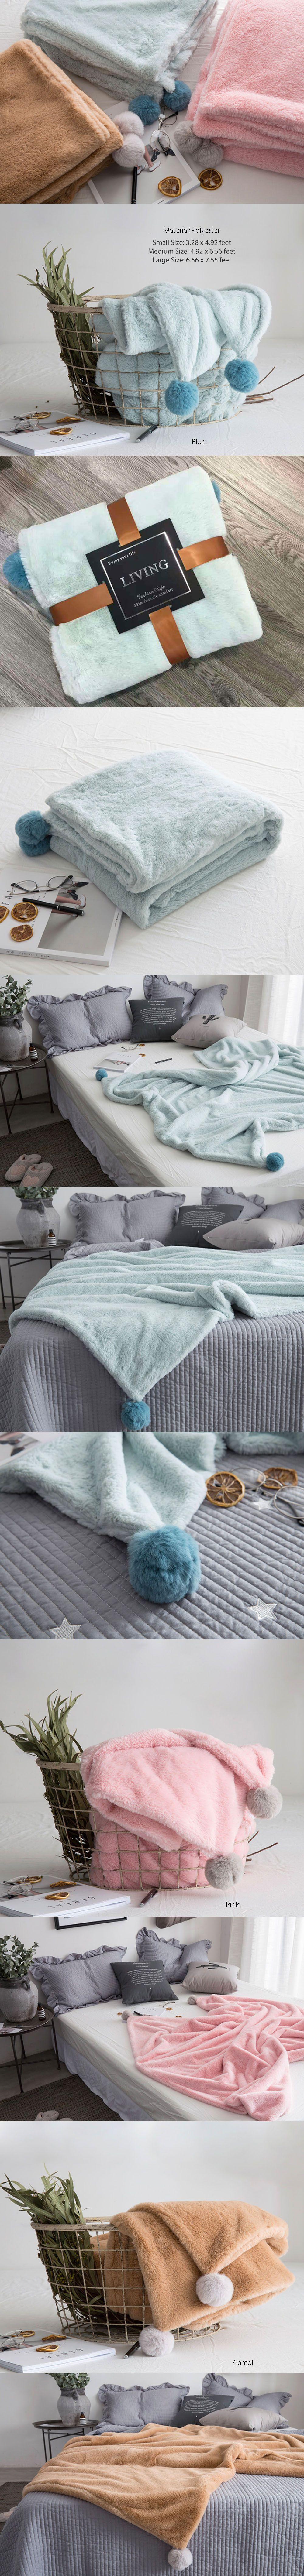 Flannel Fleece Luxury Blanket Comfy and Cozy